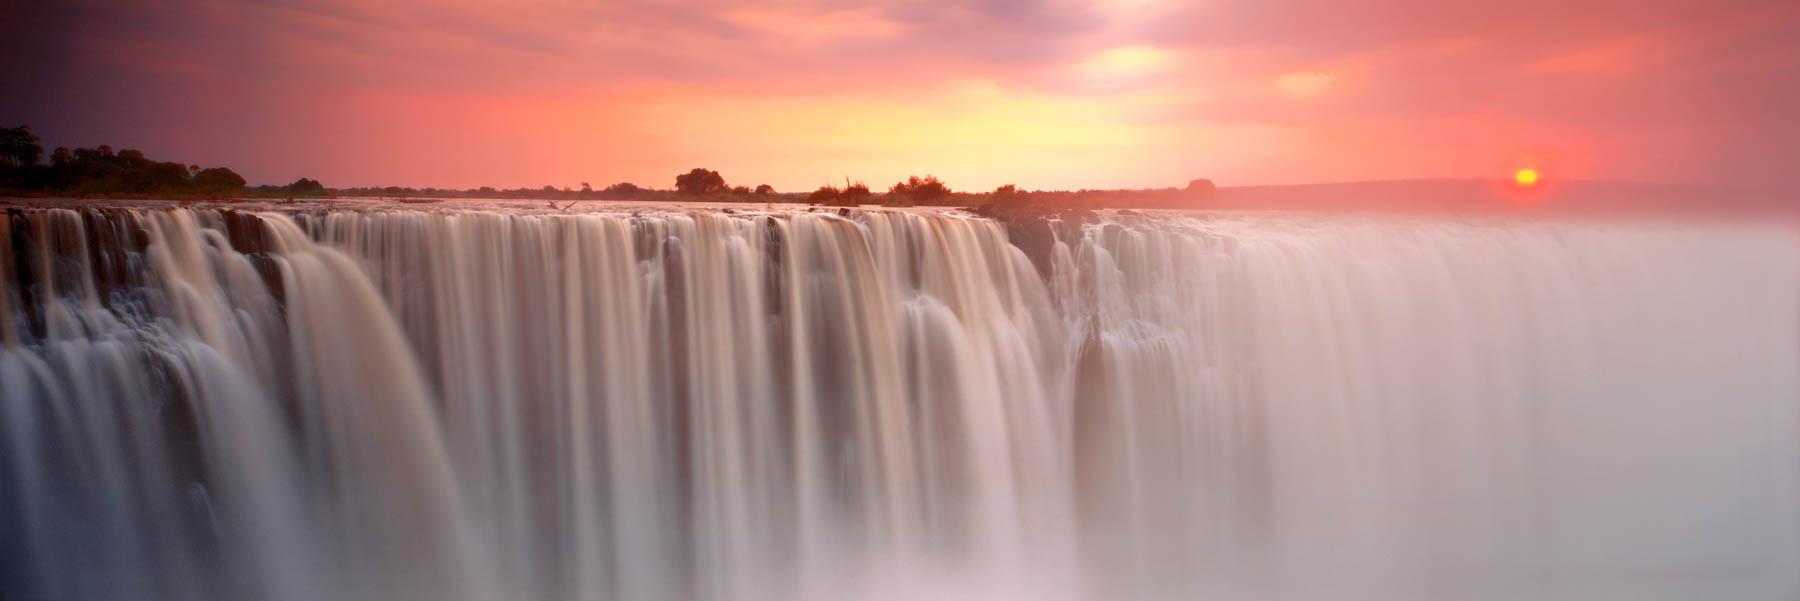 Sun rising through the mist, Victoria Falls, Zimbabwe.